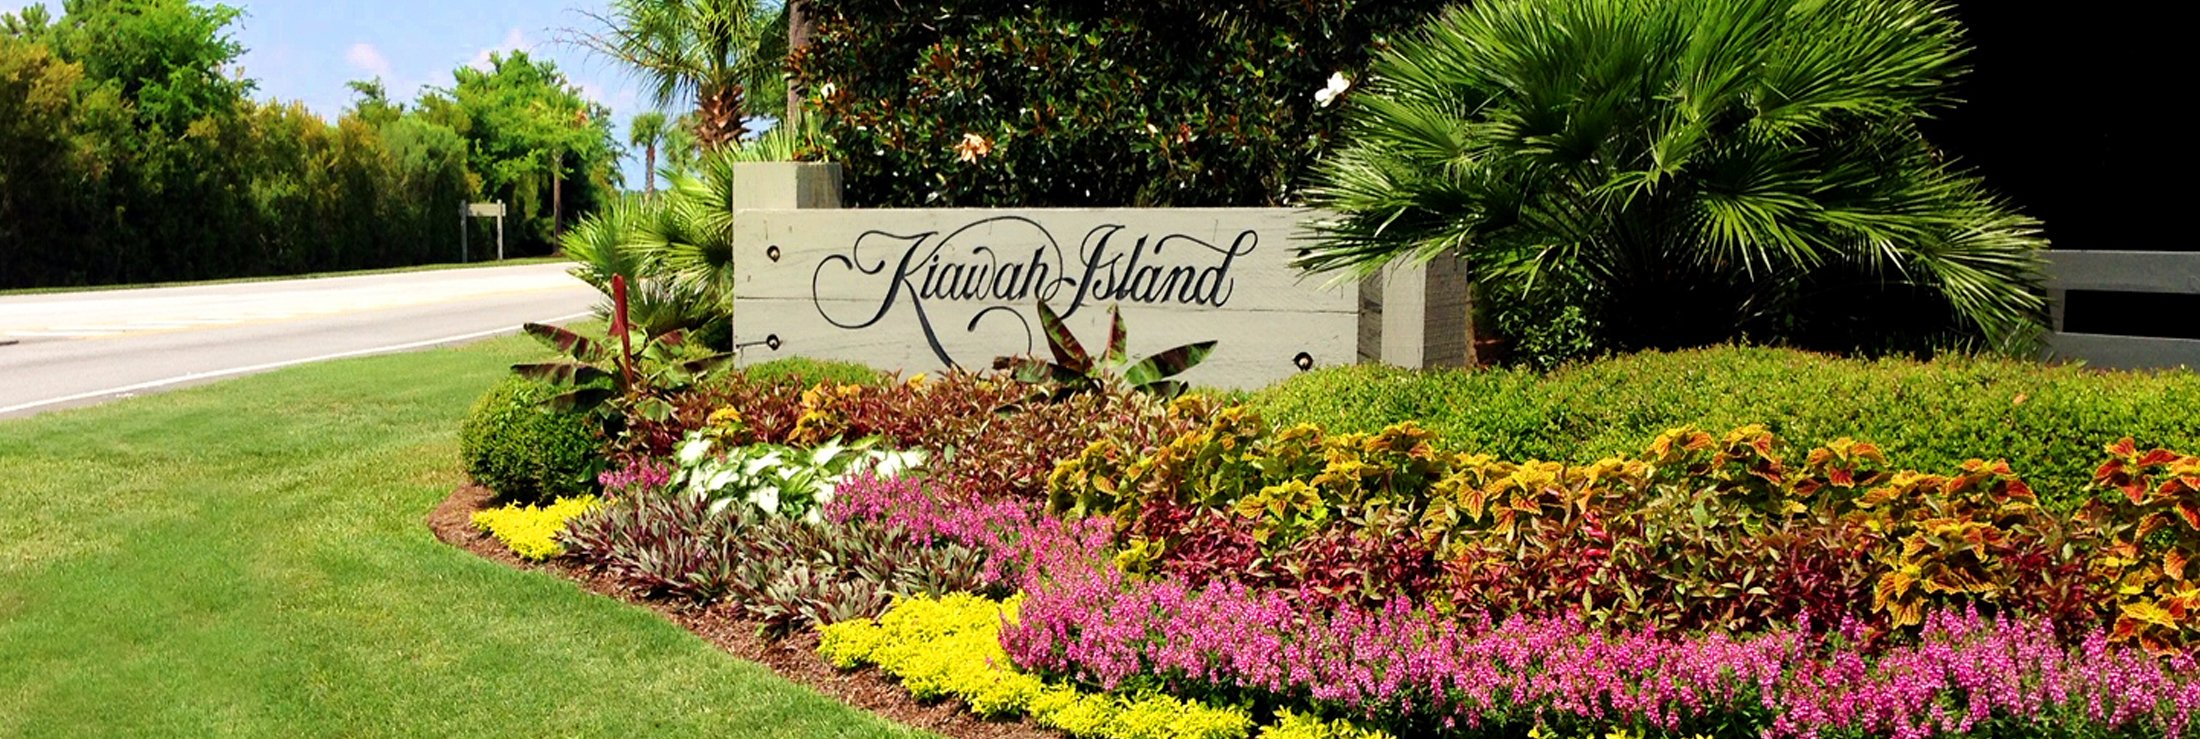 Kiawah - Seabrook Island